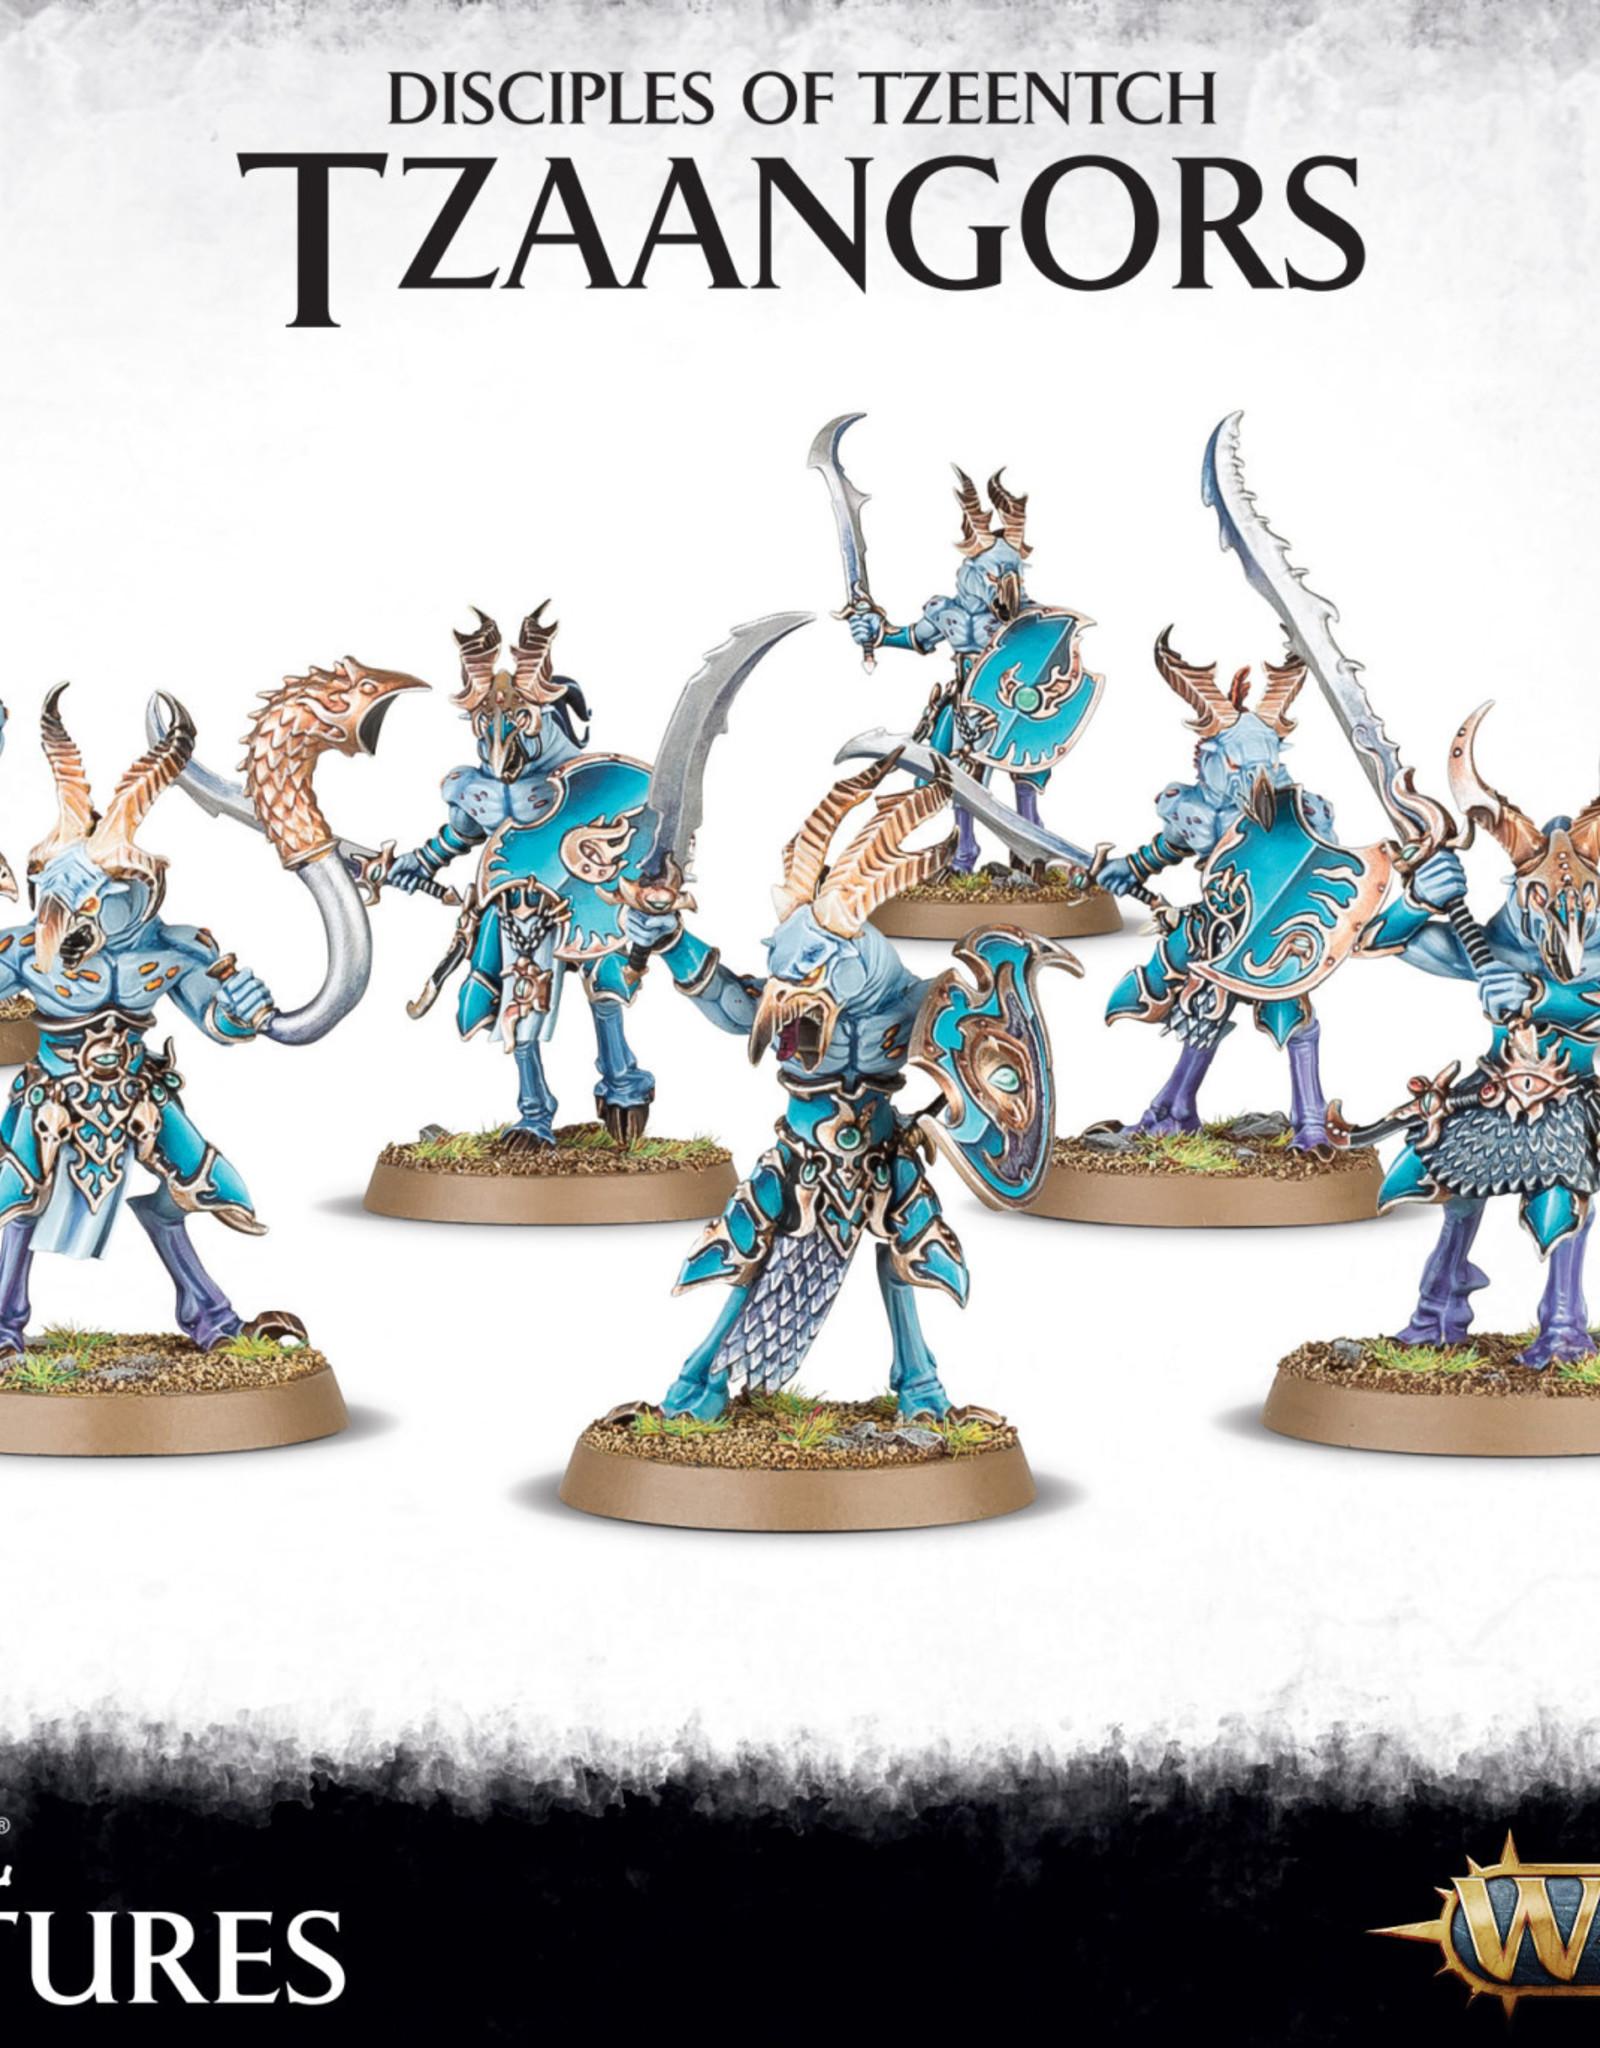 Tzeentch Arcanites Tzaangors